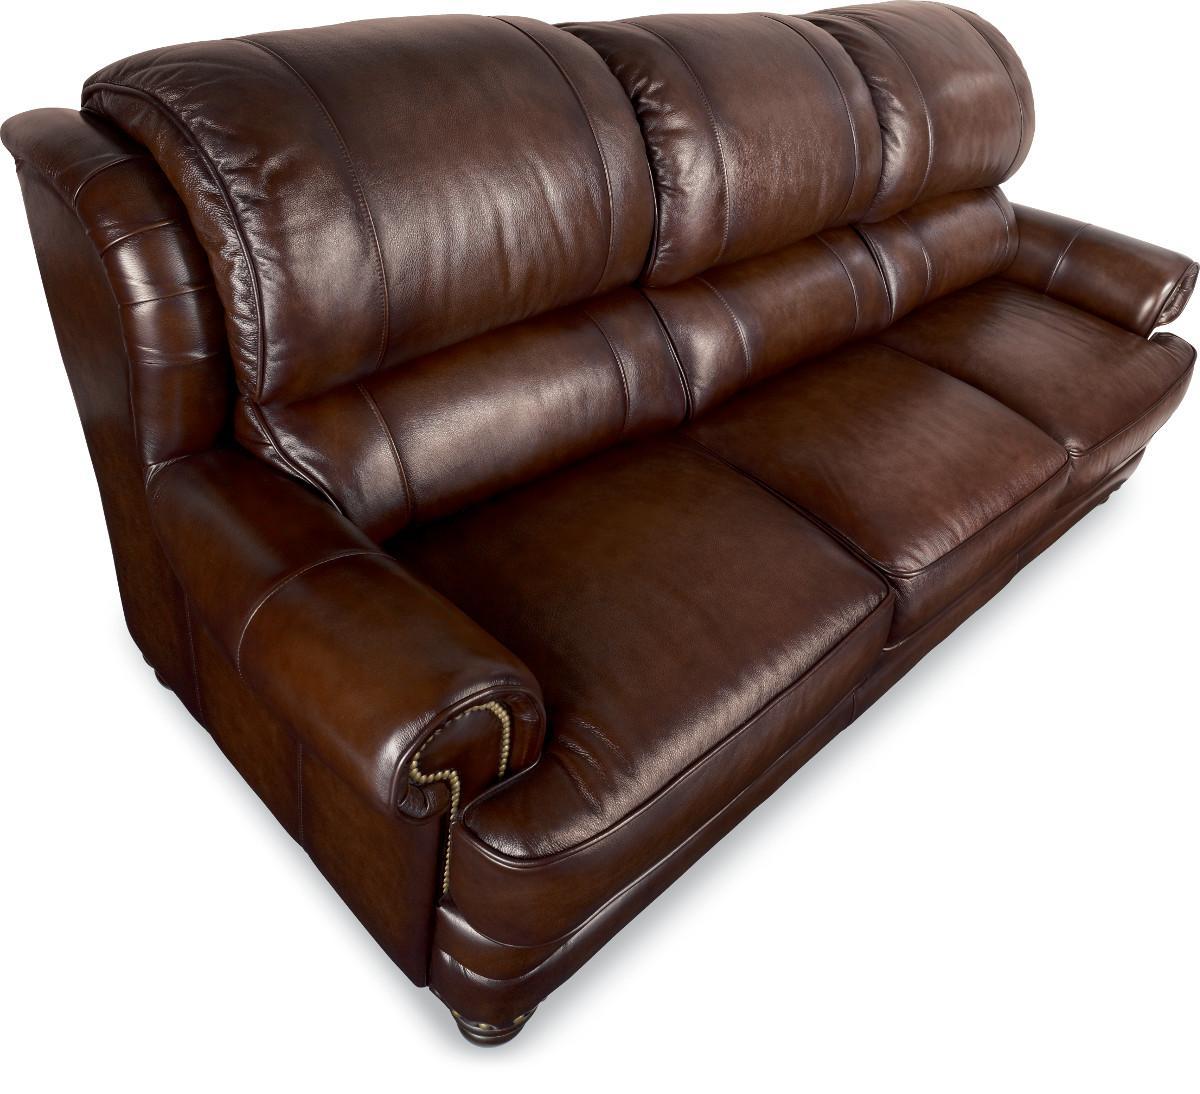 Bernhardt Sofa Leather And Fabric Black Leather Sofa